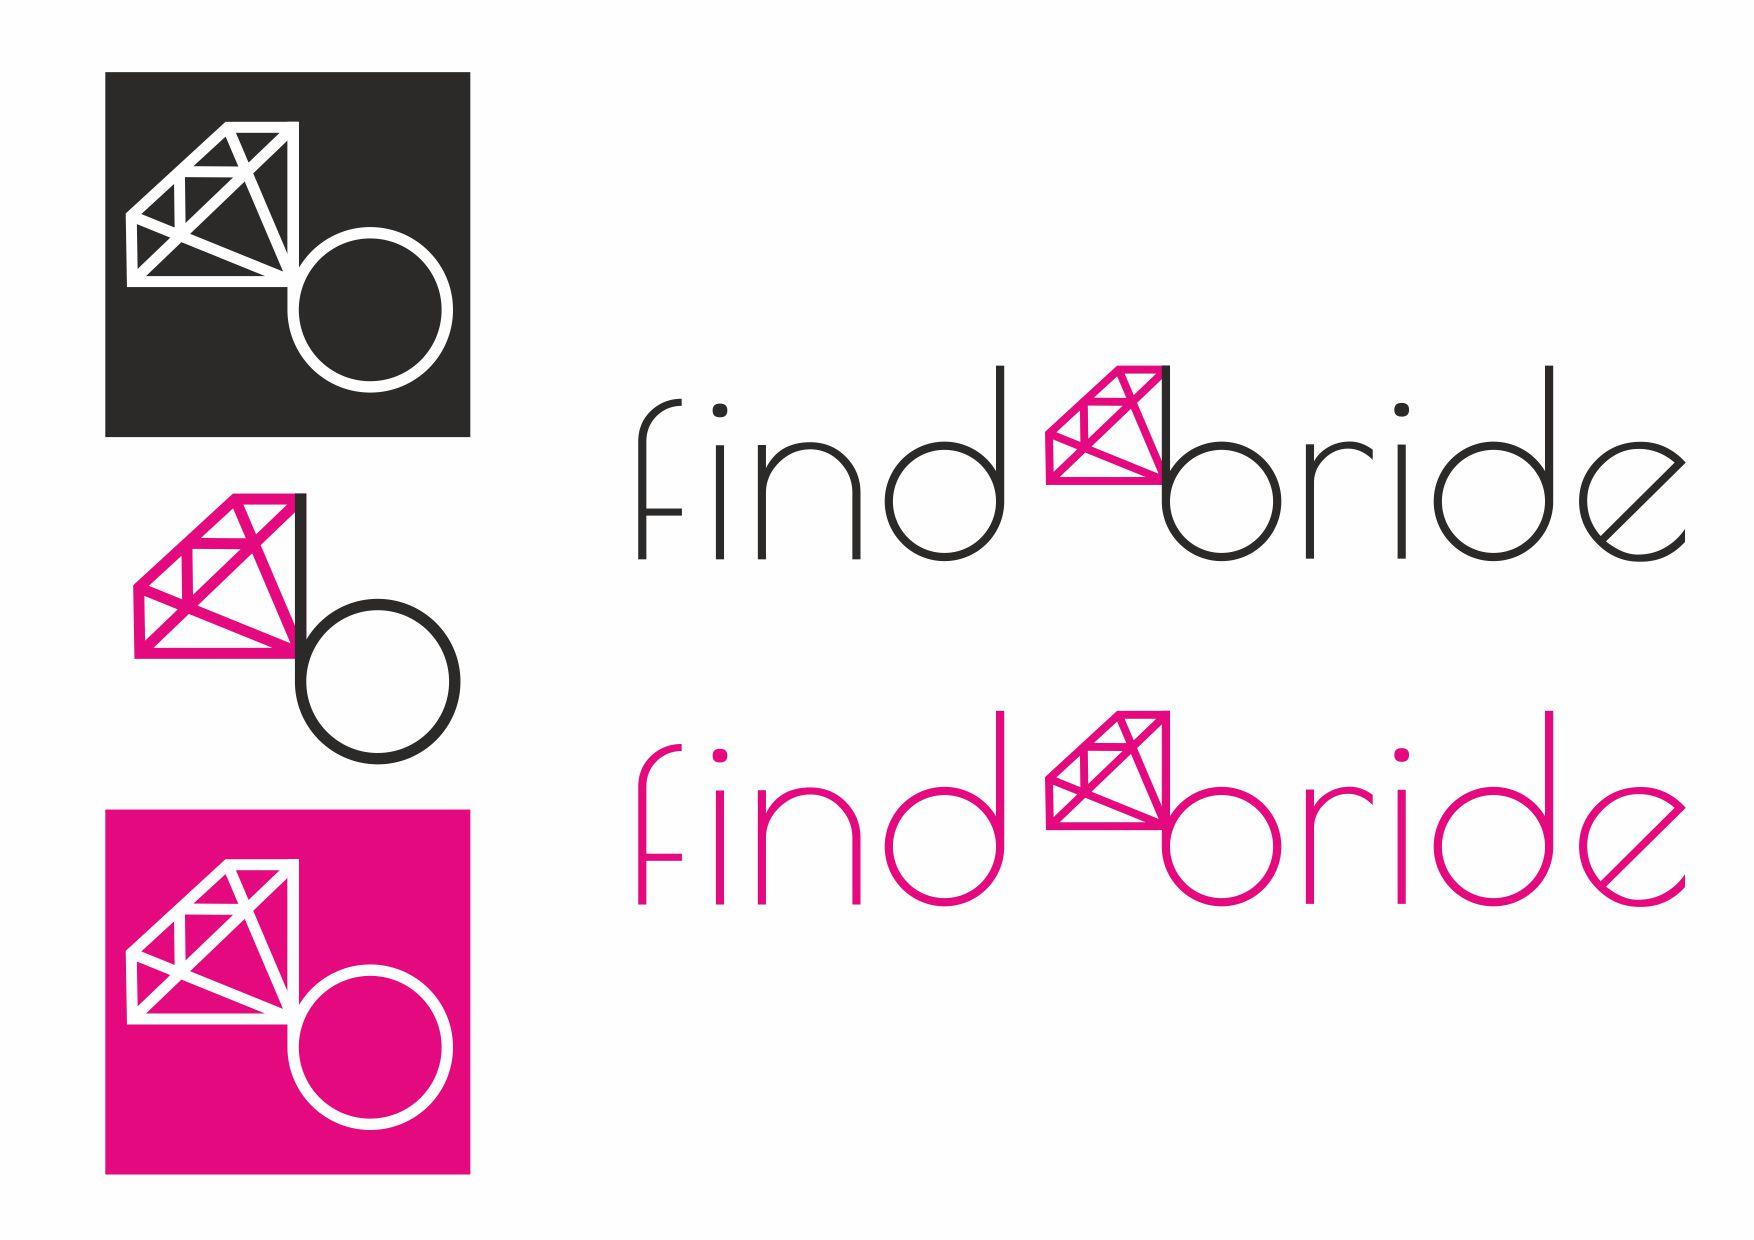 Нарисовать логотип сайта знакомств фото f_3855aced006c3c84.jpg